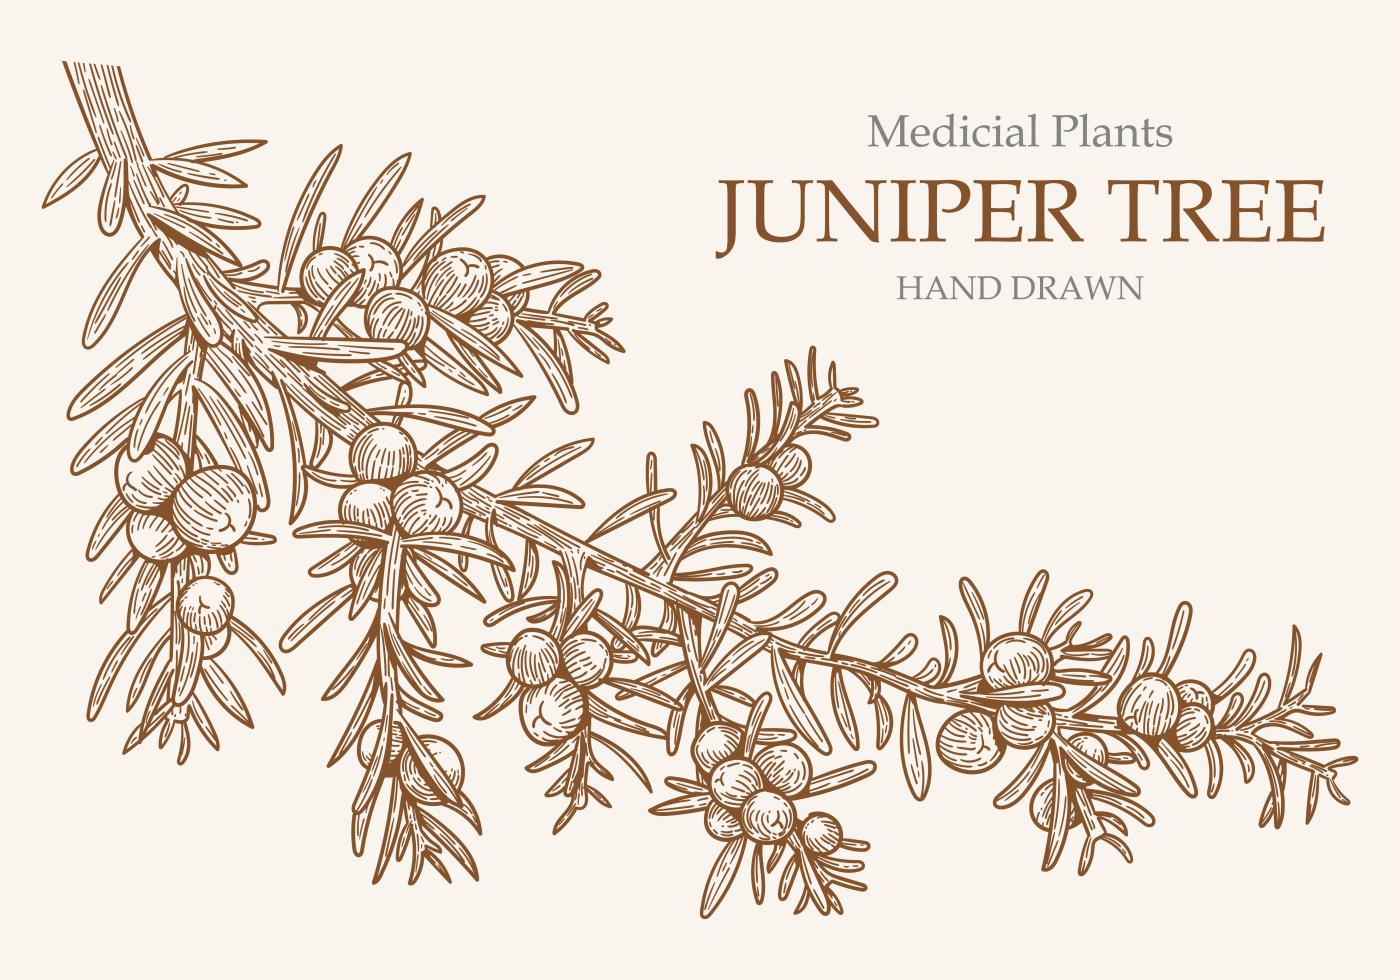 Free Hand Drawn Juniper Tree Vectors - Download Free ...